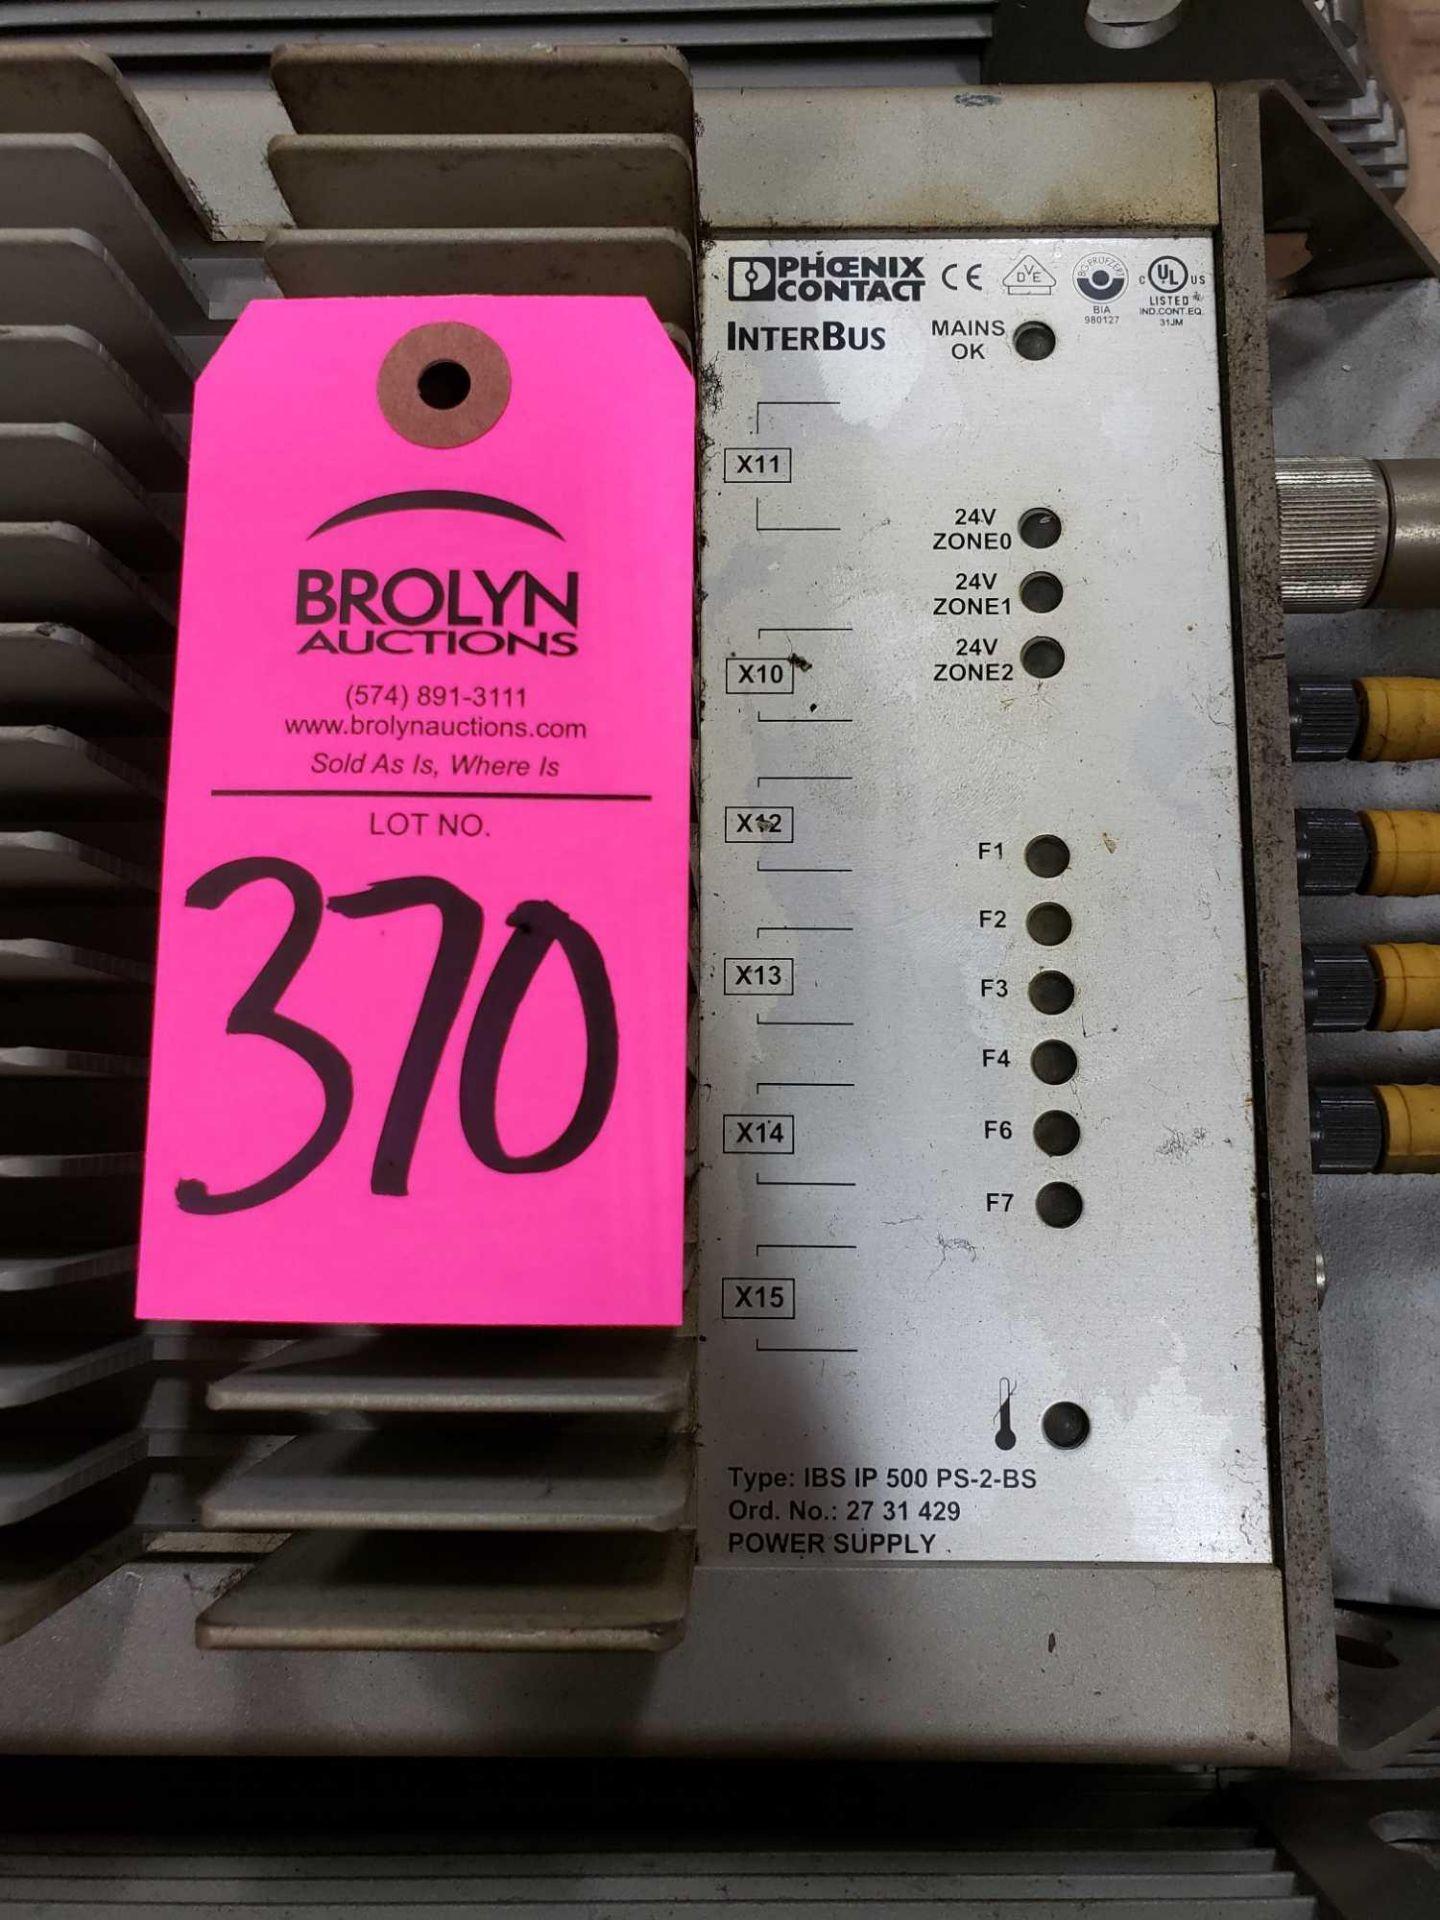 Lot 370 - Phoenix Contact Interbus Type IBS-IP-500-PS-2-BS power supply.